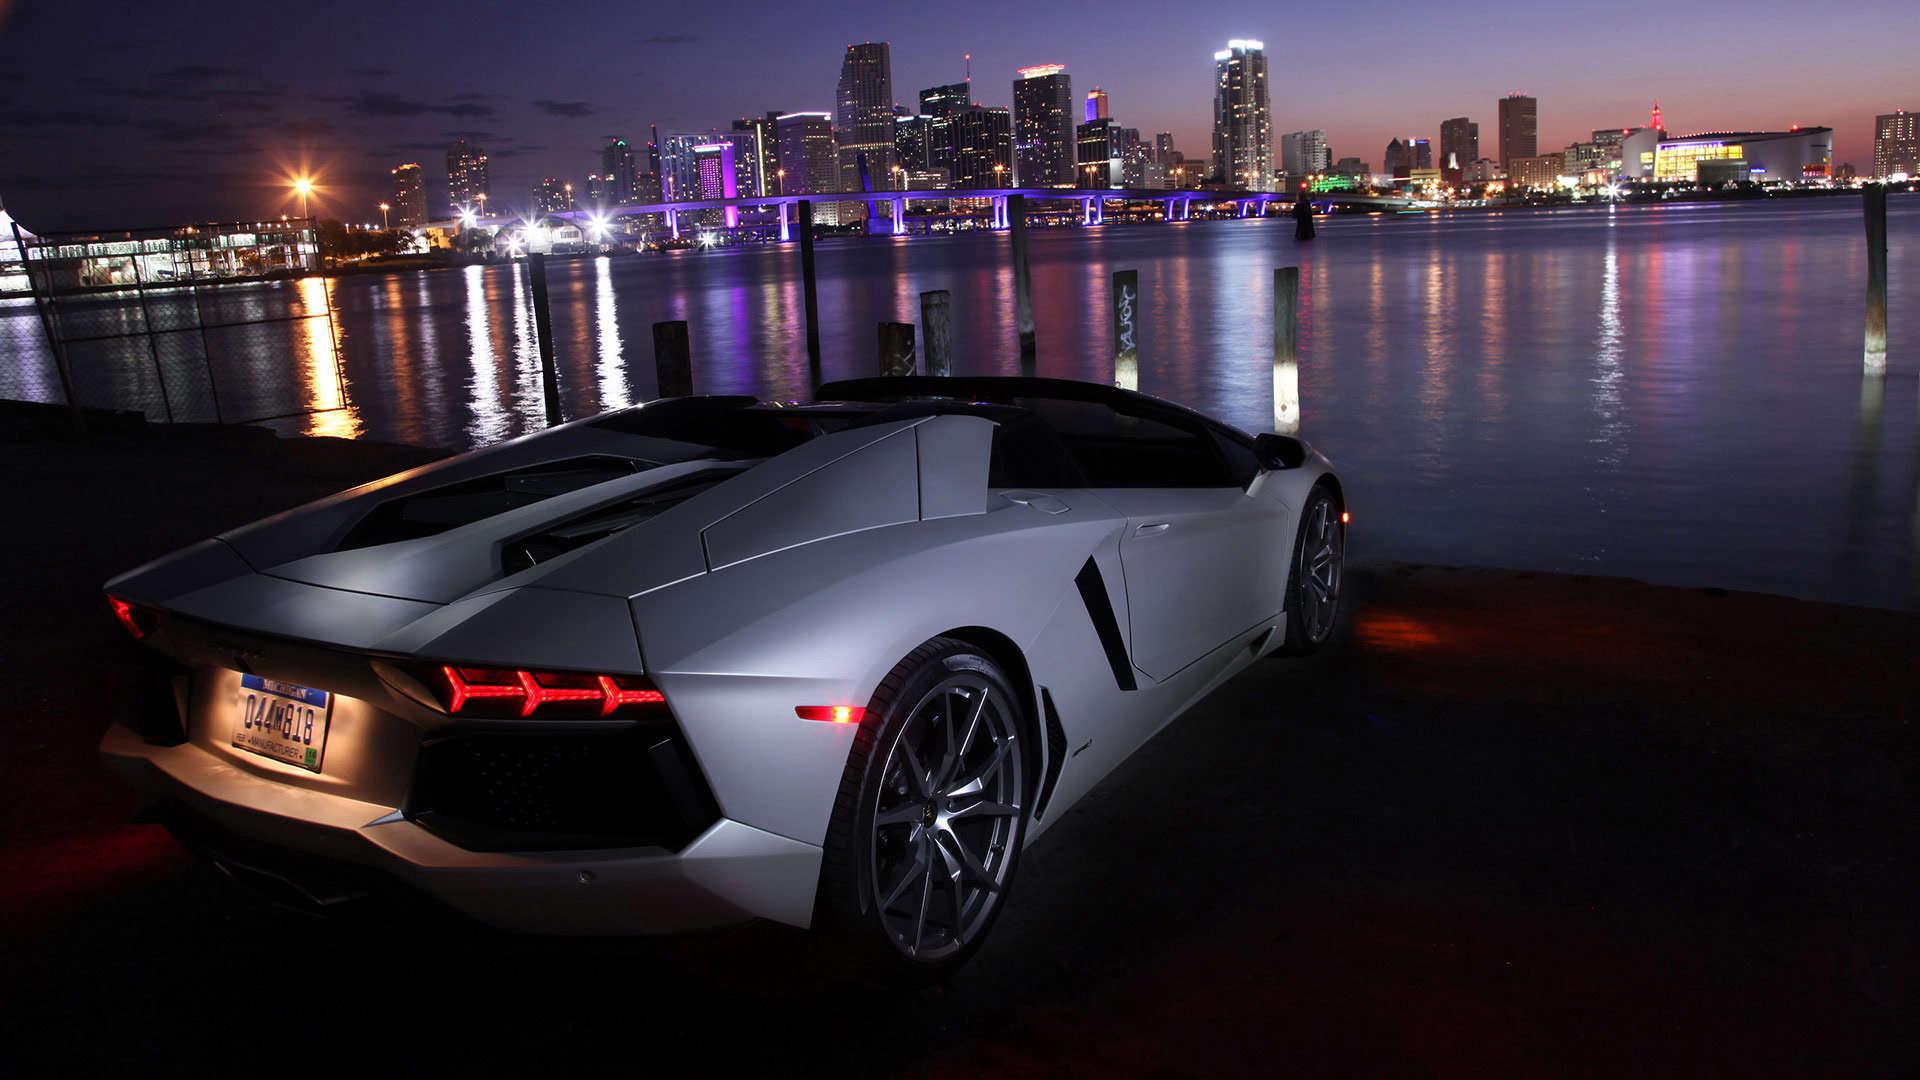 Lamborghini Aventador Wallpaper Hd 1080p 19137 MOVDATA 1920x1080